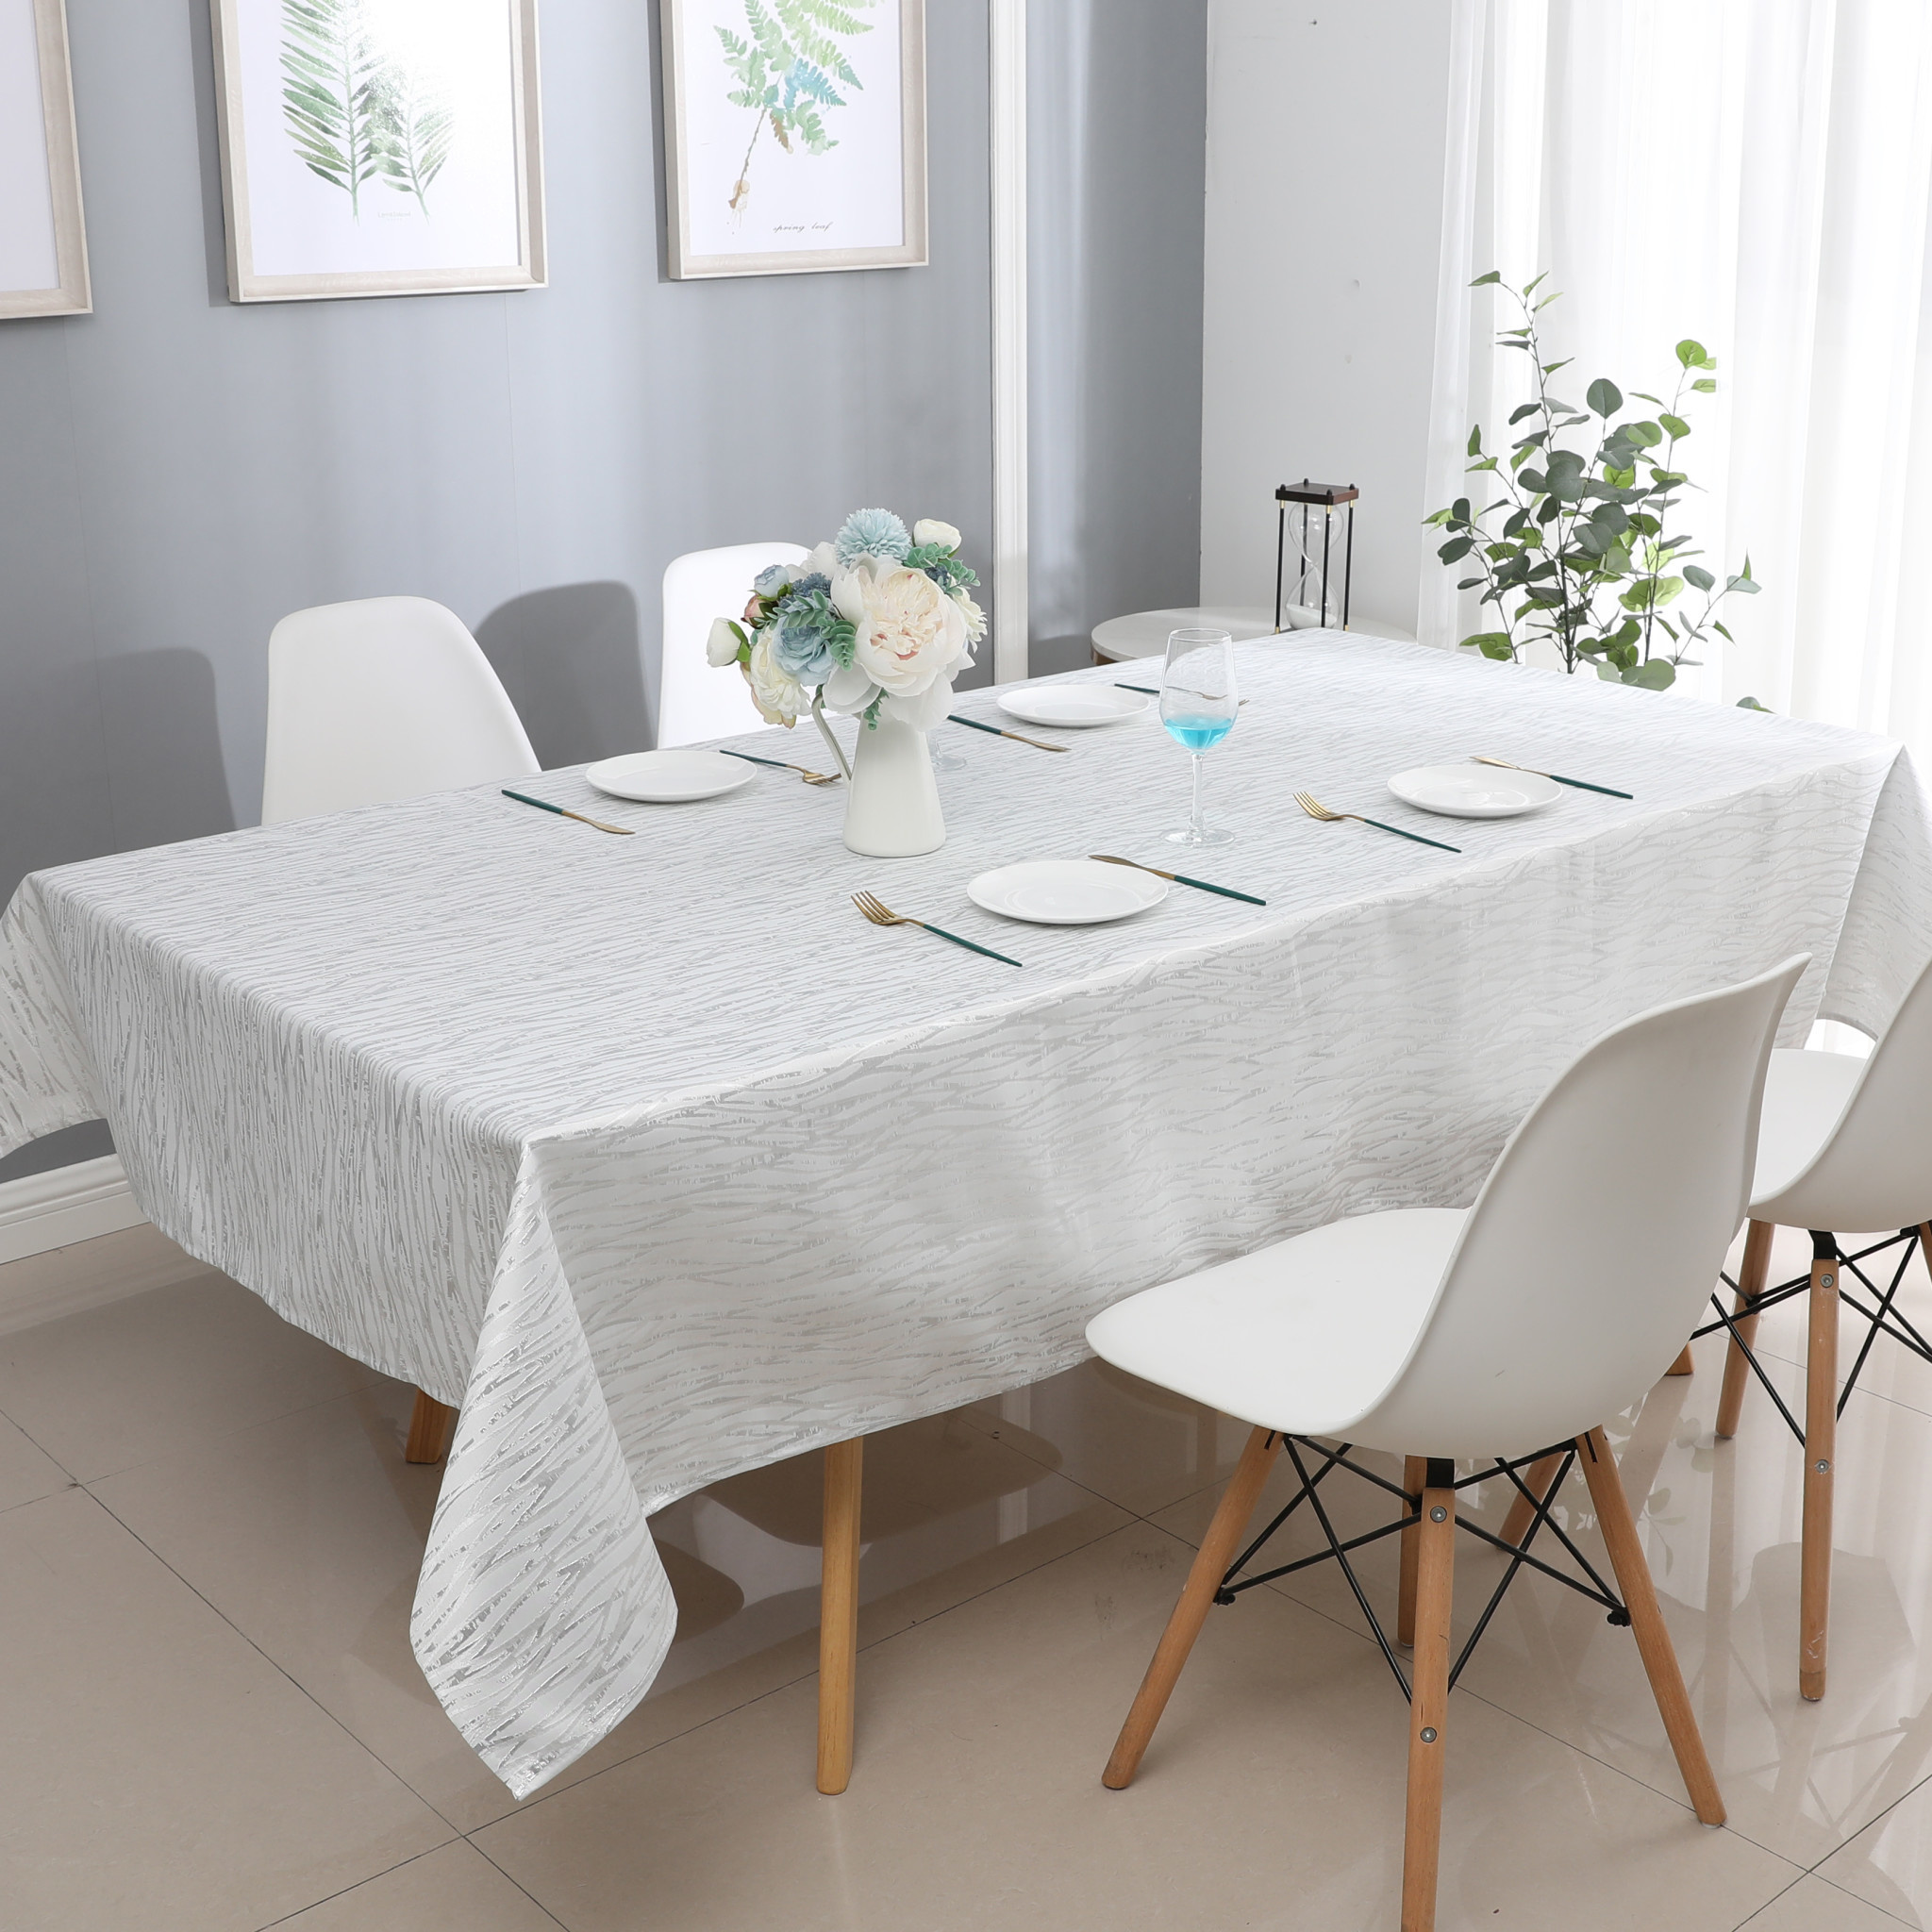 TC1317- 70 x 120 Jacquard  White/silver Tablecloth